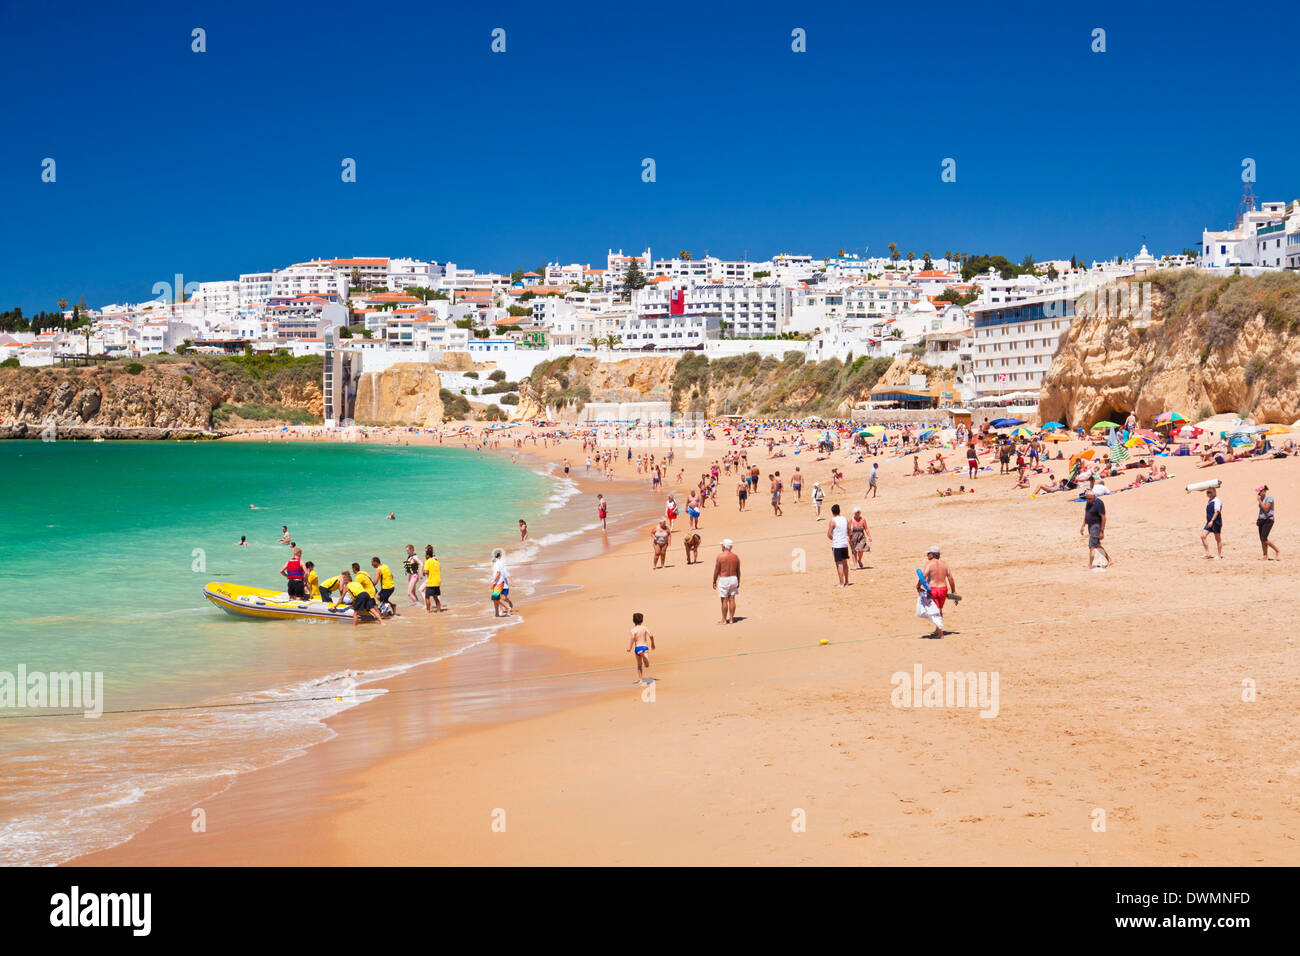 Holidaymakers on Fishermans Beach (Praia dos Pescadores), Albufeira Beach, Algarve, Portugal, EuropeStock Photo